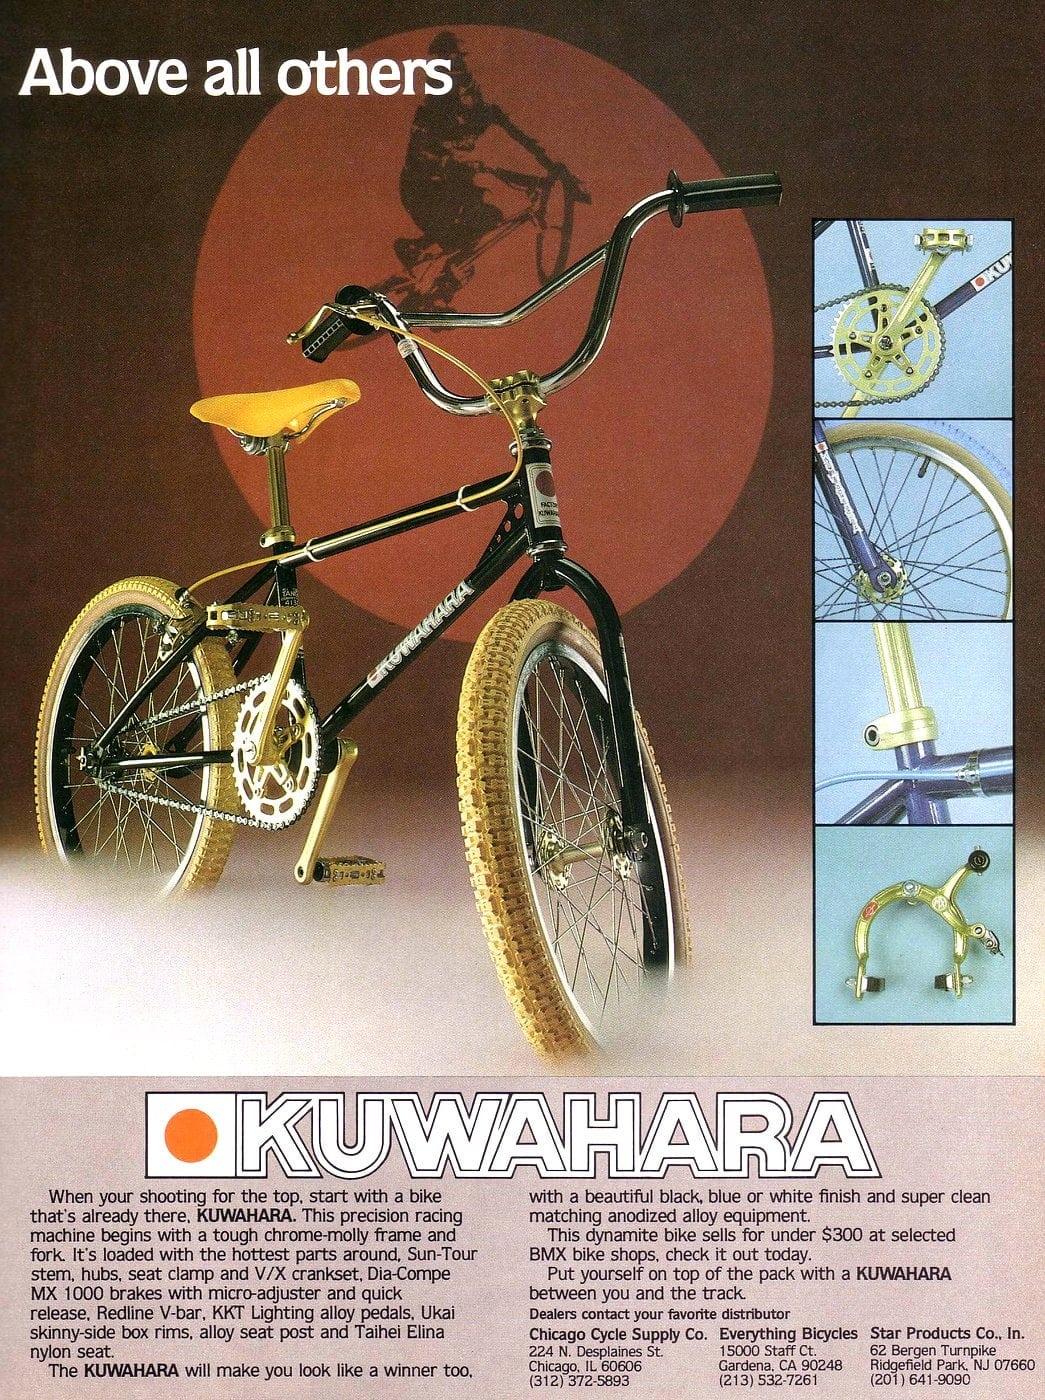 Kuwahara bicycles